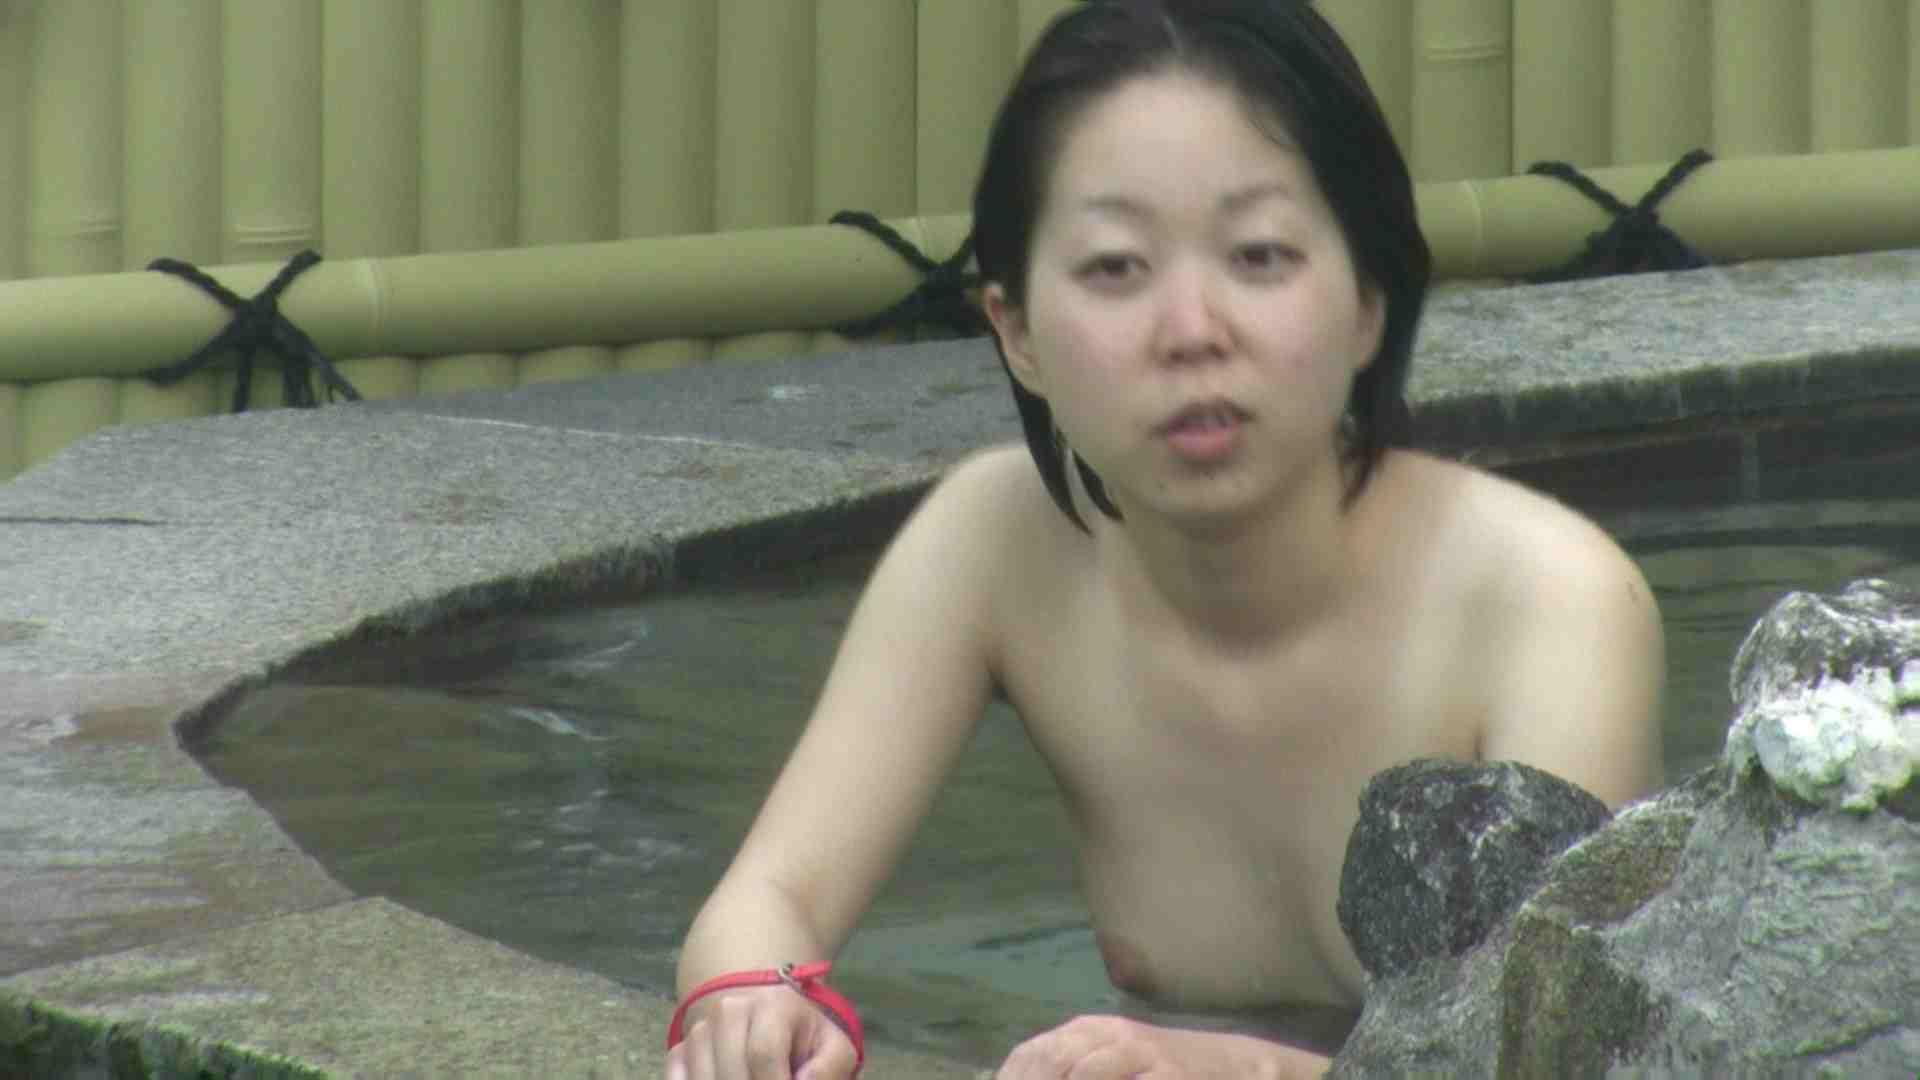 Aquaな露天風呂Vol.06【VIP】 盗撮 | OLエロ画像  113PICs 4